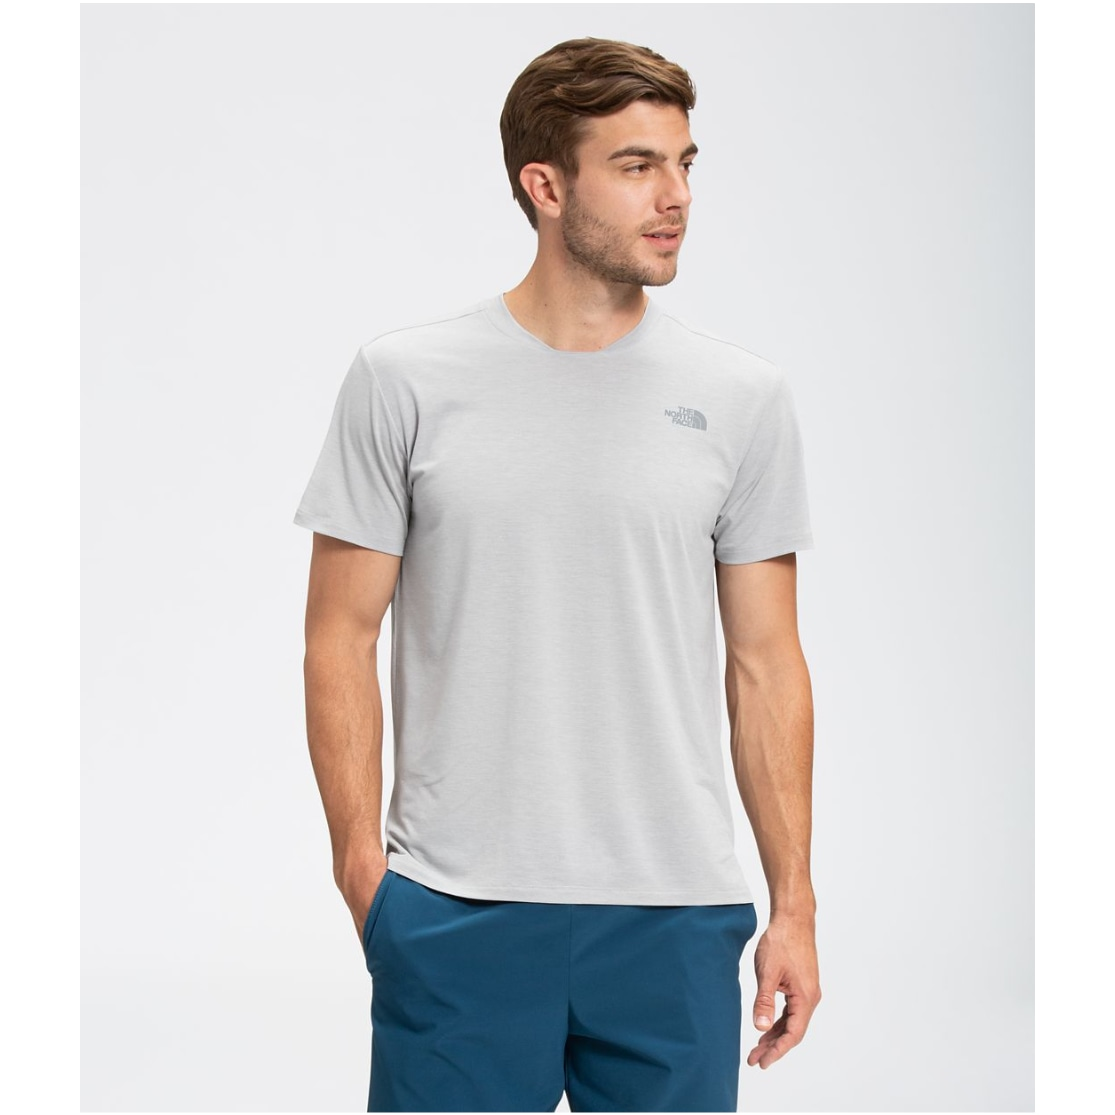 Wander Short Sleeve - Men's